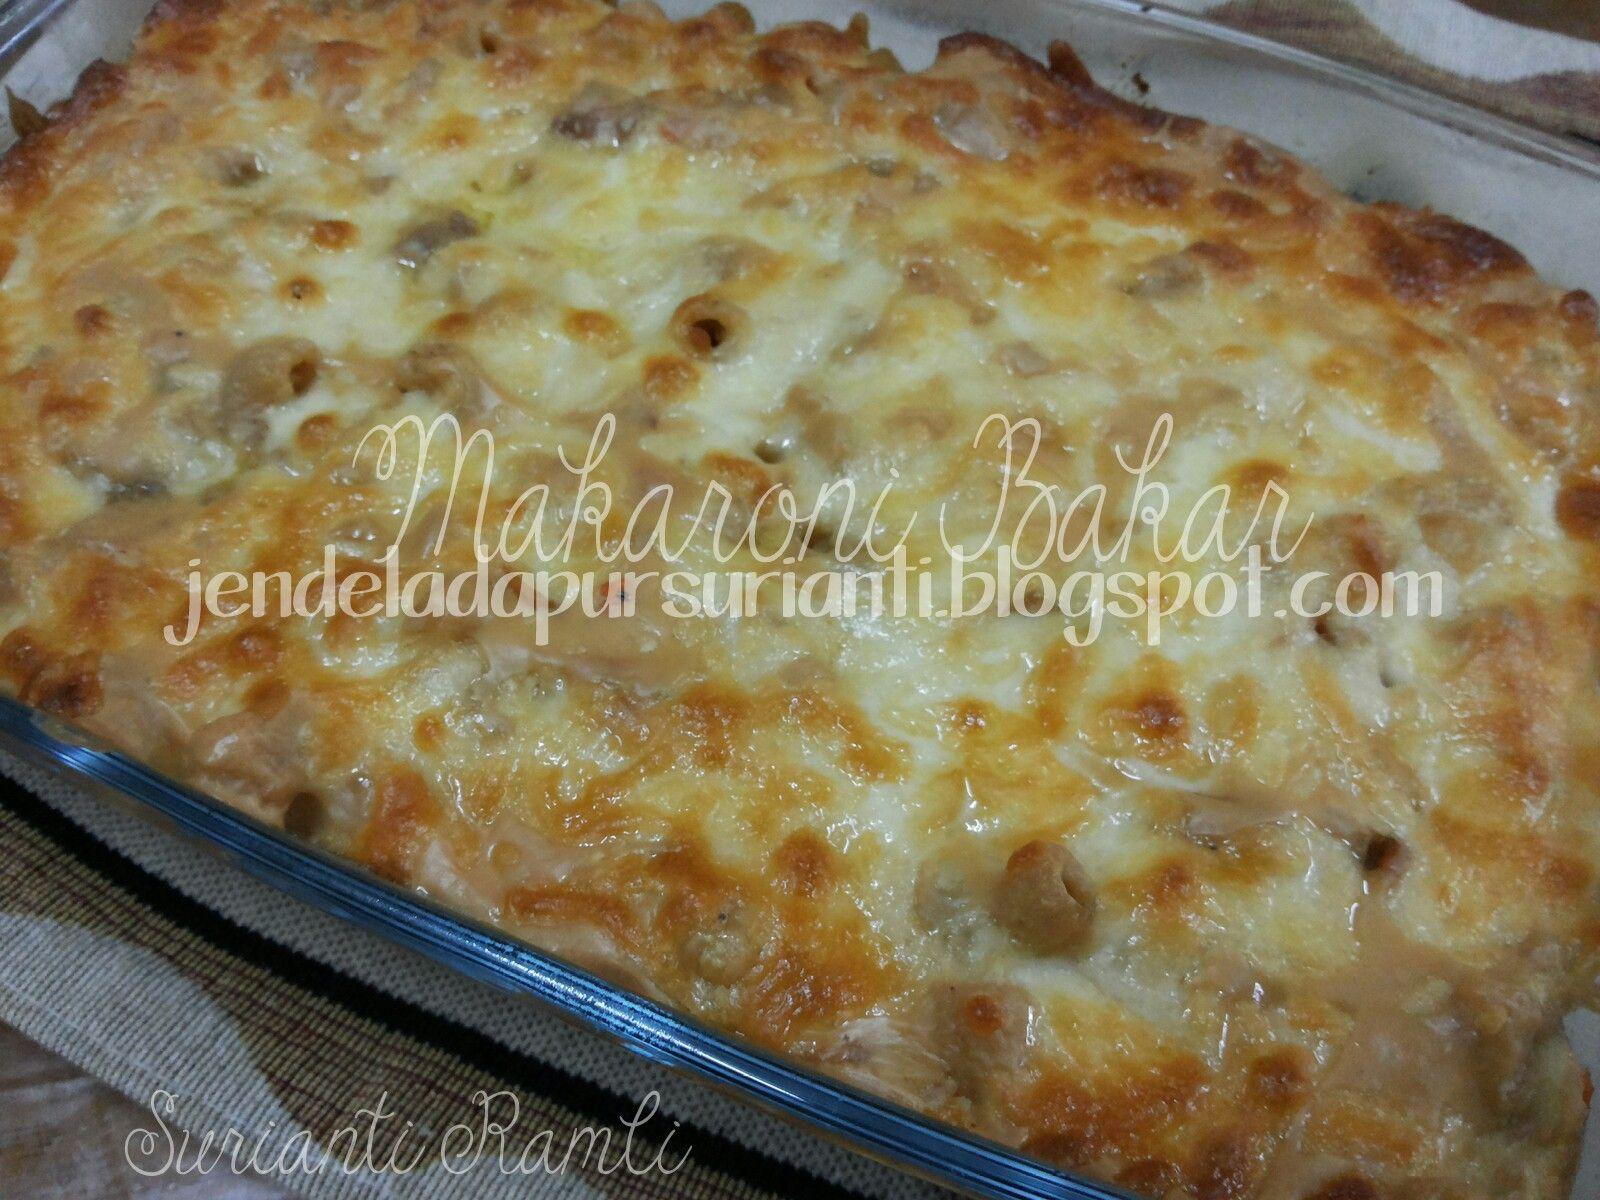 Alhamdulillah Dinner Kami Jam 7 Tadi Makaroni Bakar Ini Lebih Kurang Dengan Resepi Makaroni Goreng Yang Pernah Sue Macaroni Cheese Food Macaroni And Cheese